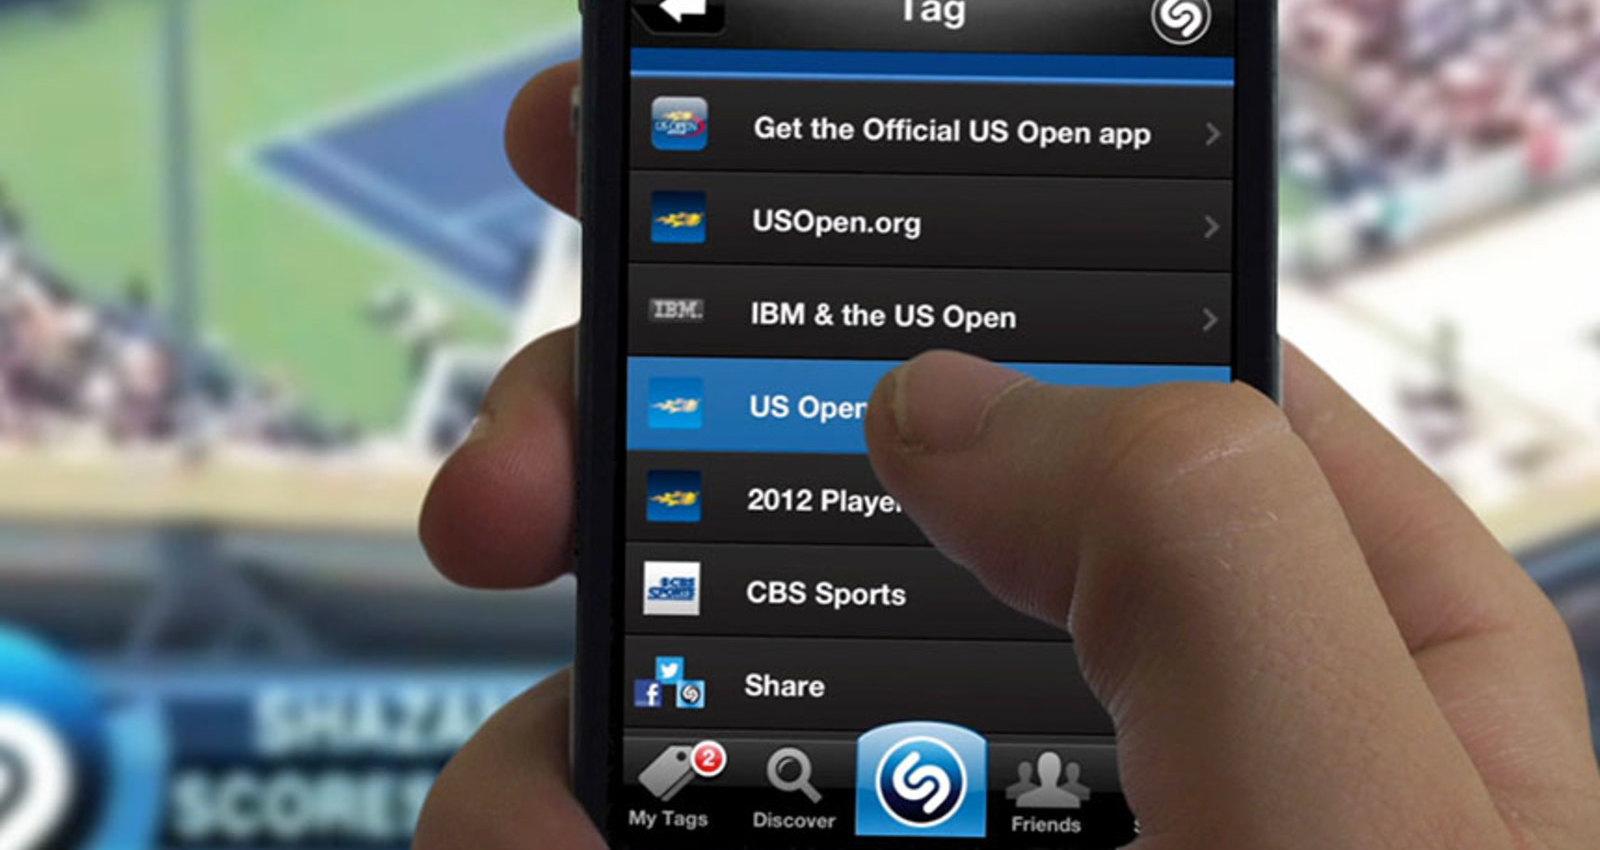 US Open Live Shazam Experience